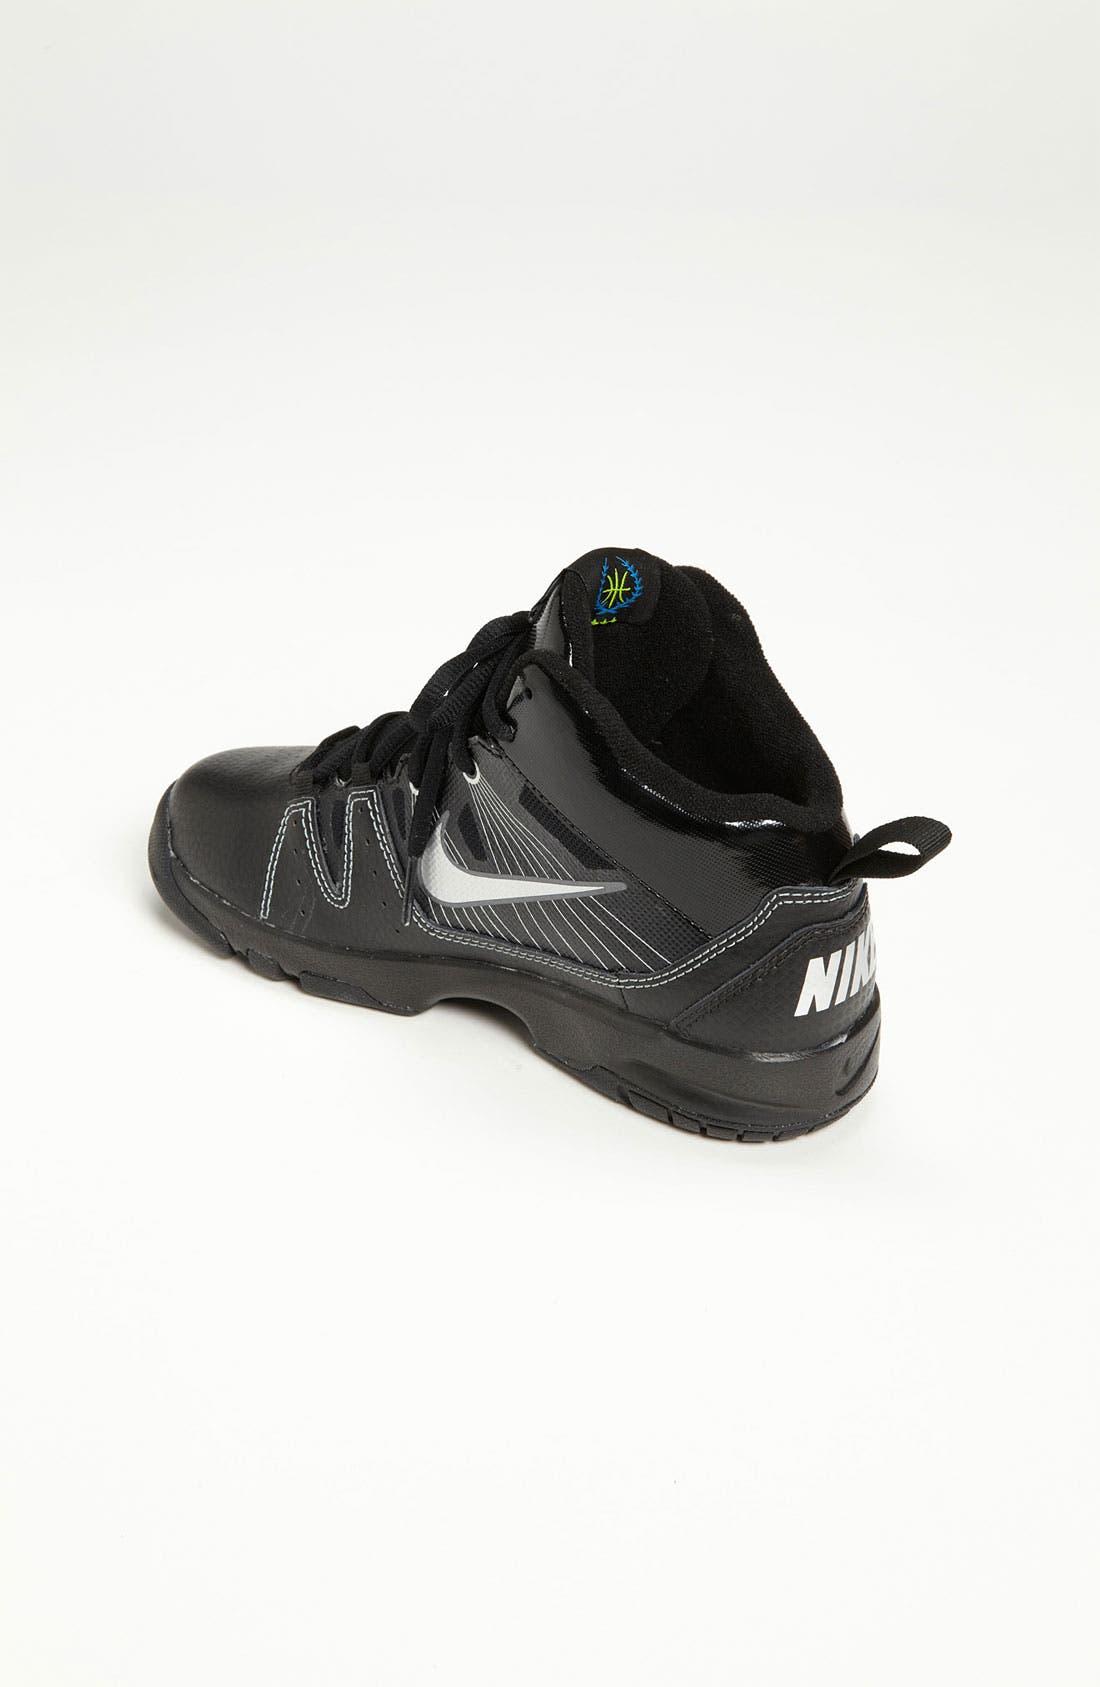 Alternate Image 2  - Nike 'Flight Jab Step' Basketball Shoe (Toddler, Little Kid & Big Kid)